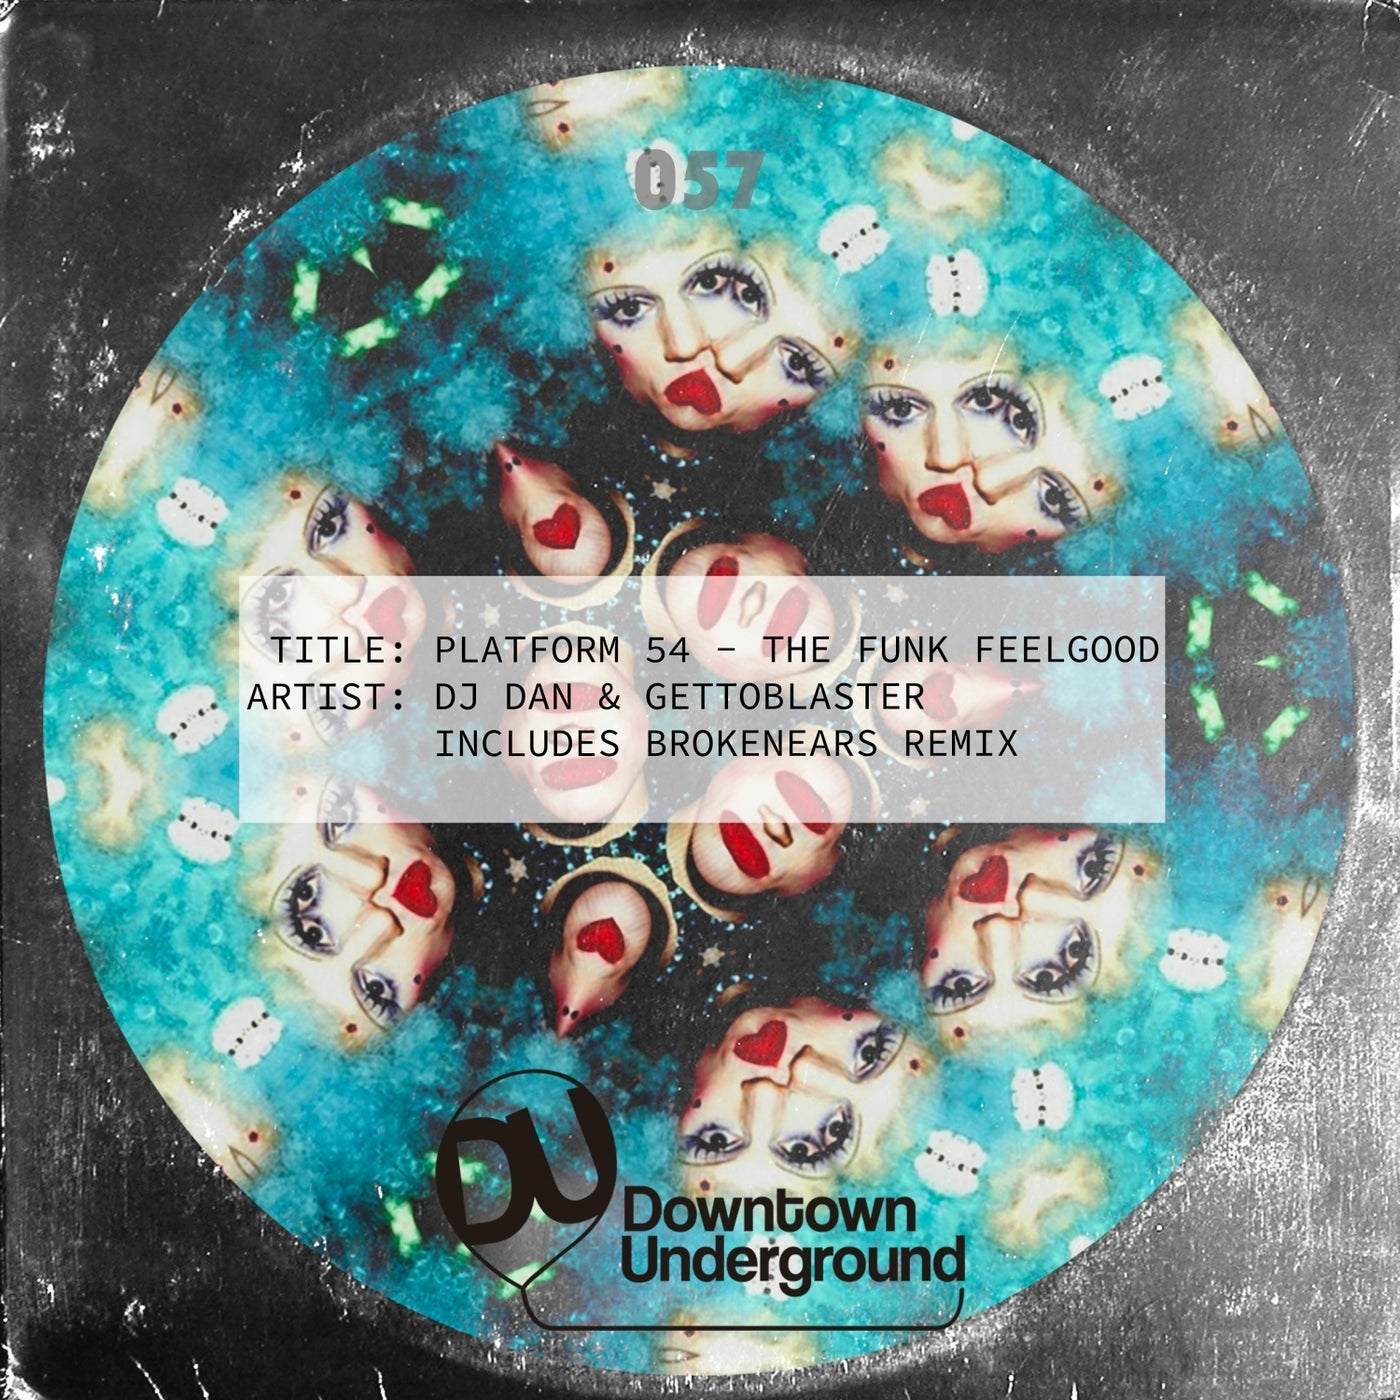 Platform 54 - The Funk Feelgood